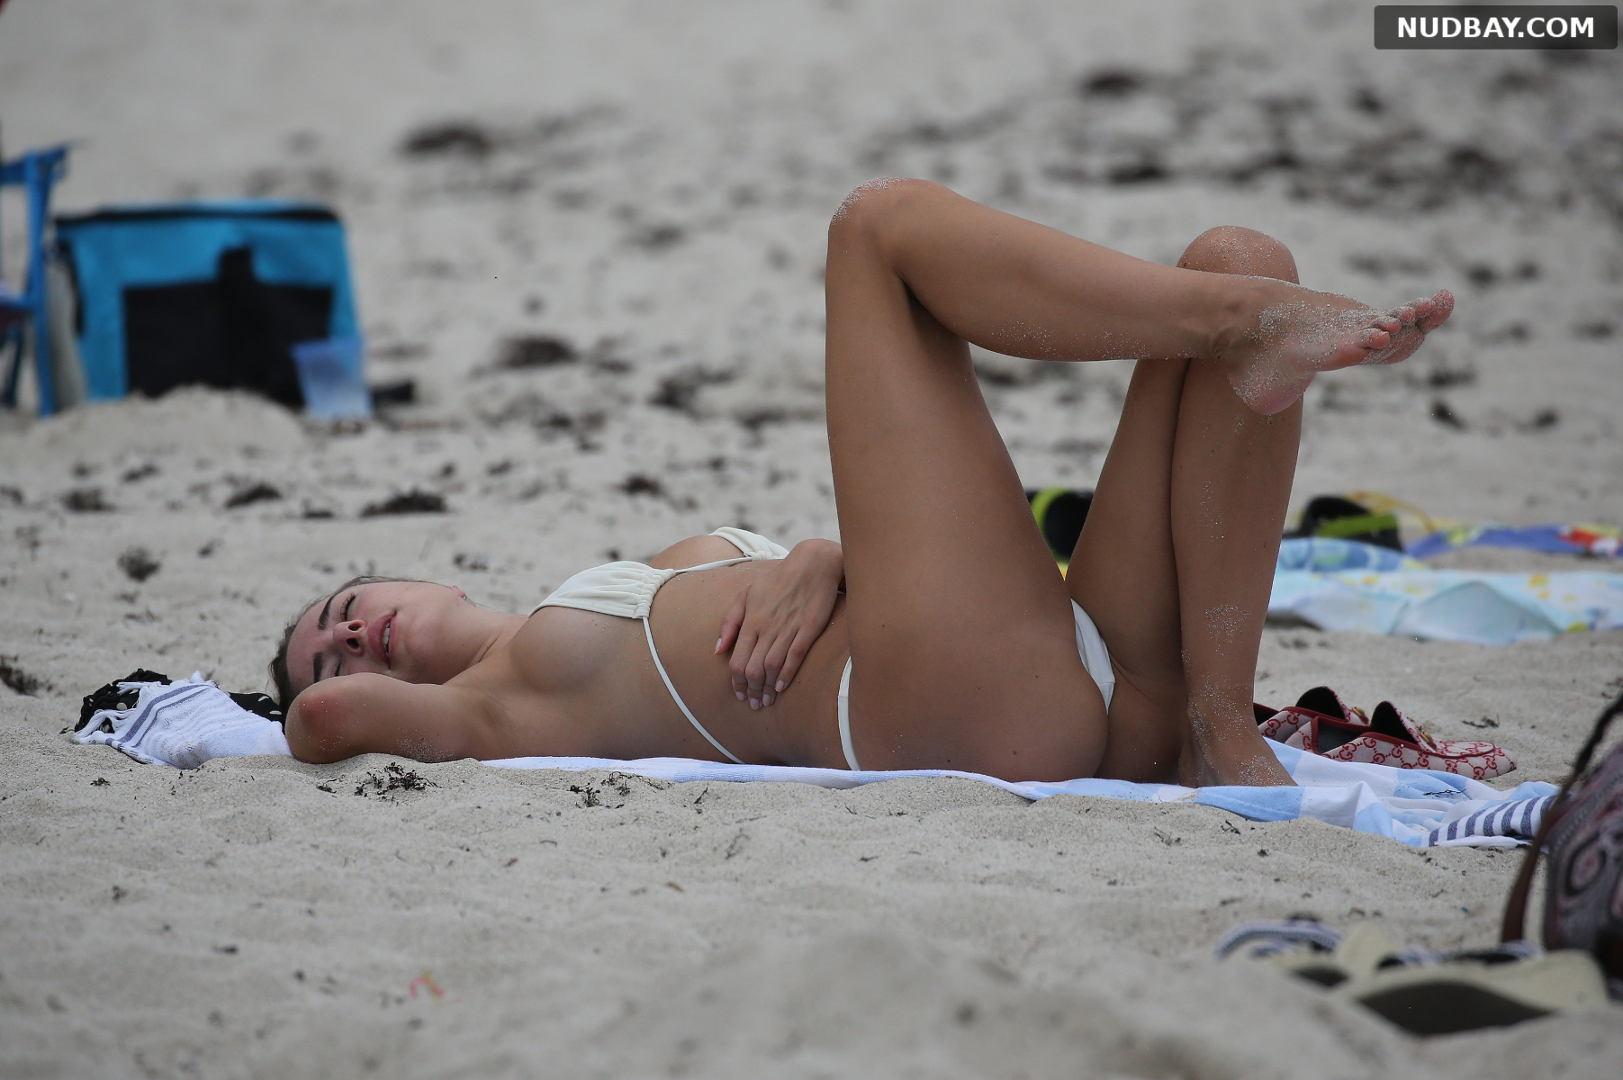 Kimberley Garner pussy bikini on holiday in Miami Apr 02 2019